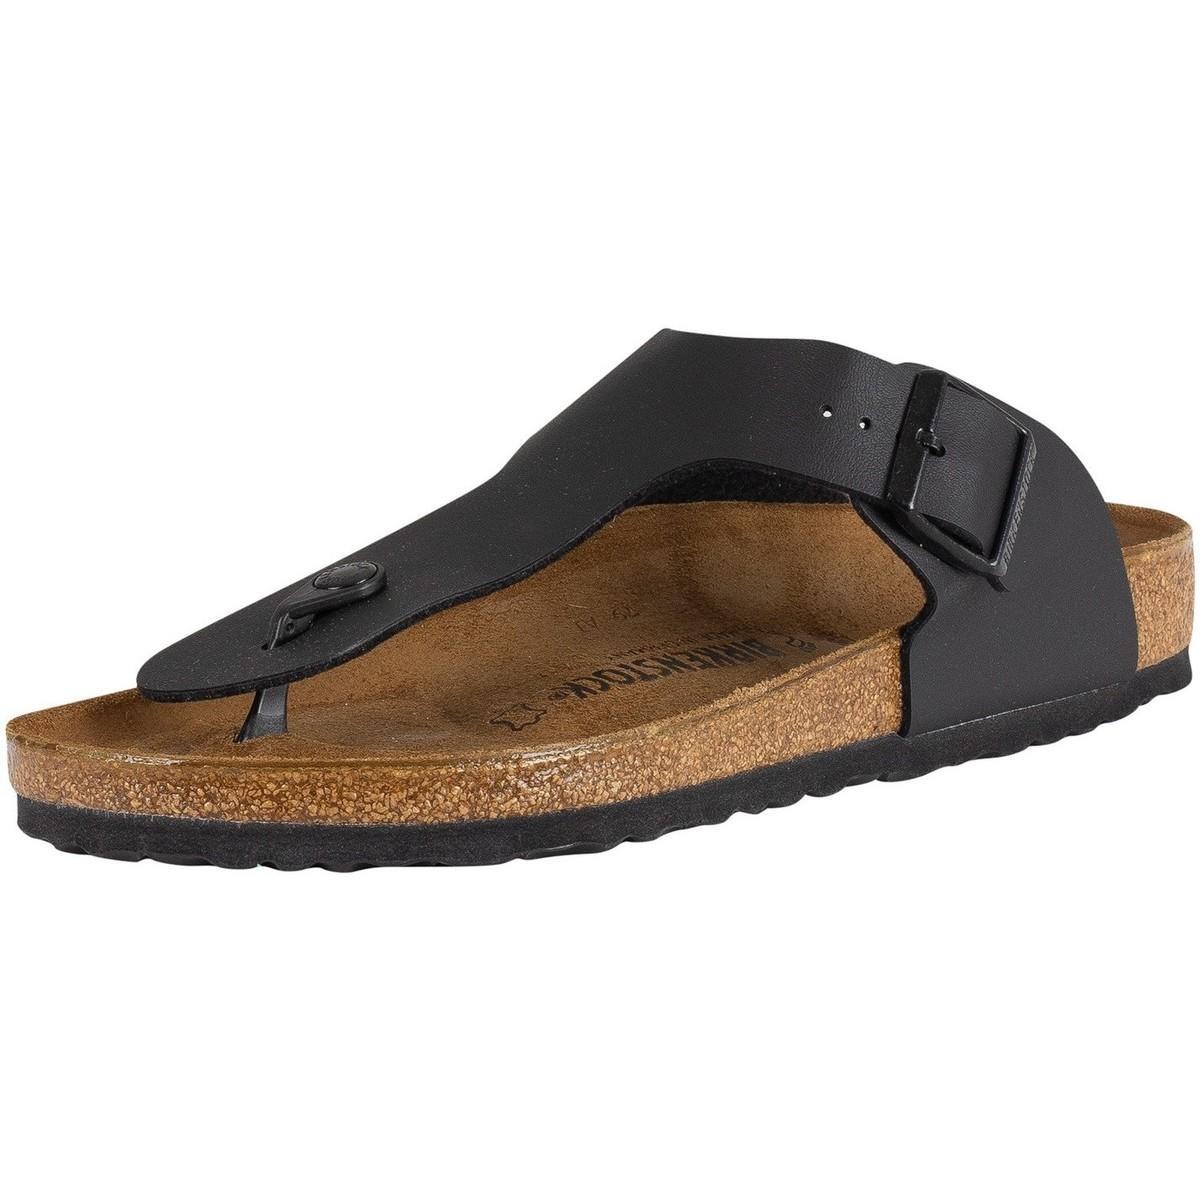 690fe0a65 Birkenstock. Men's Ramses Bs Leather Sandals, Black Men's Mules ...